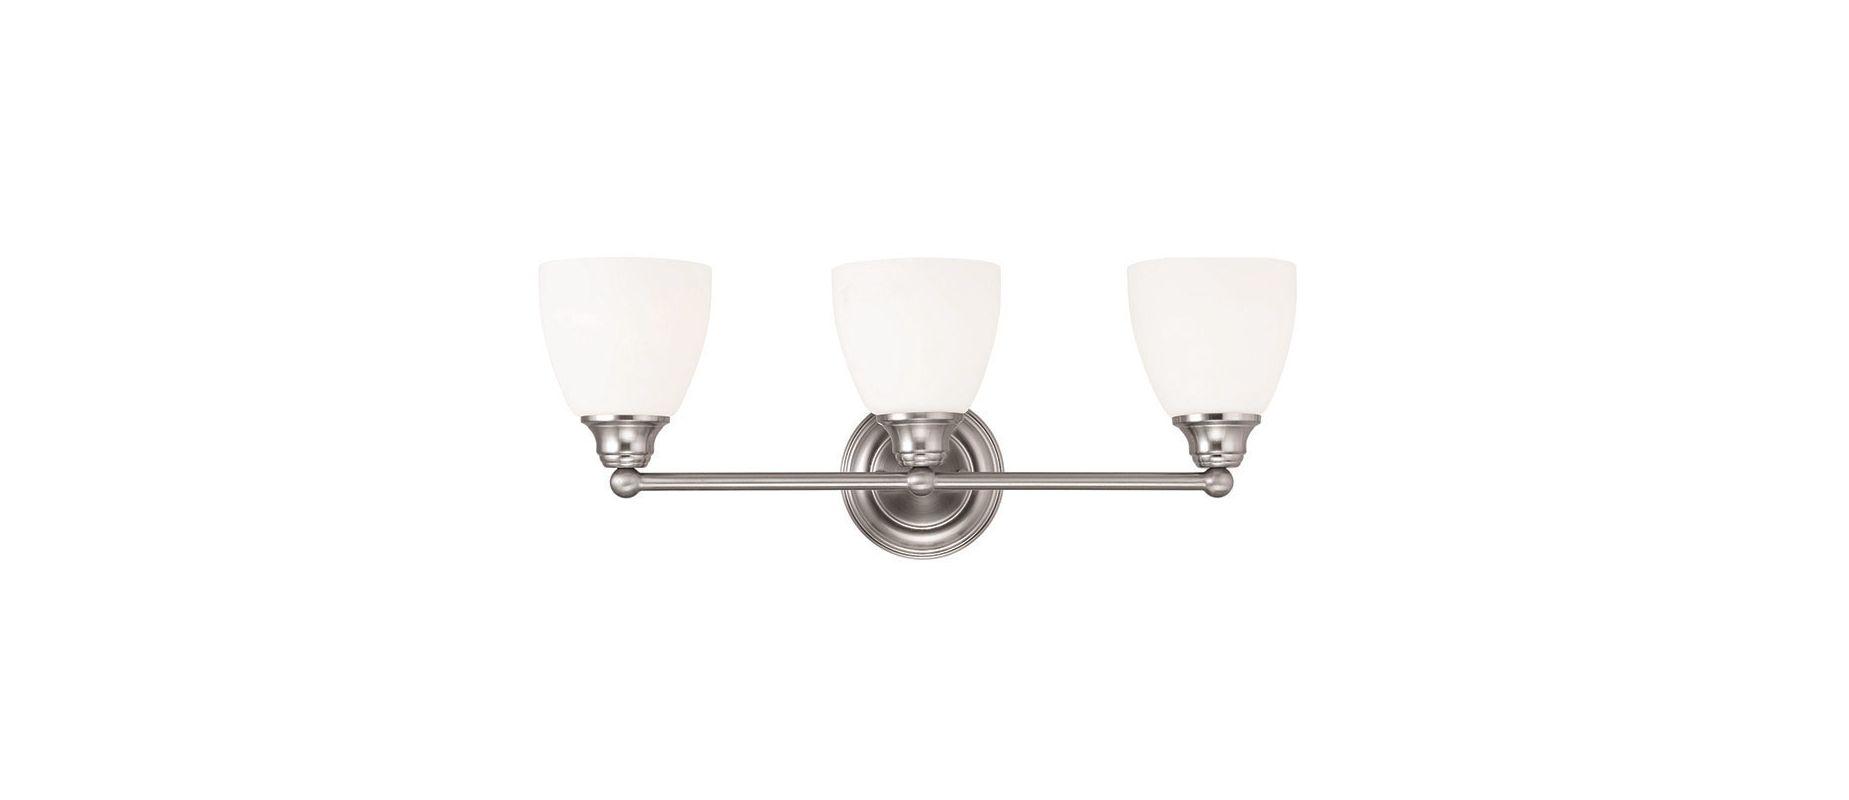 Livex Oldwick Modern Brushed Nickel 3 Light Bathroom: Livex Lighting 13663-91 Brushed Nickel Somerville 3 Light